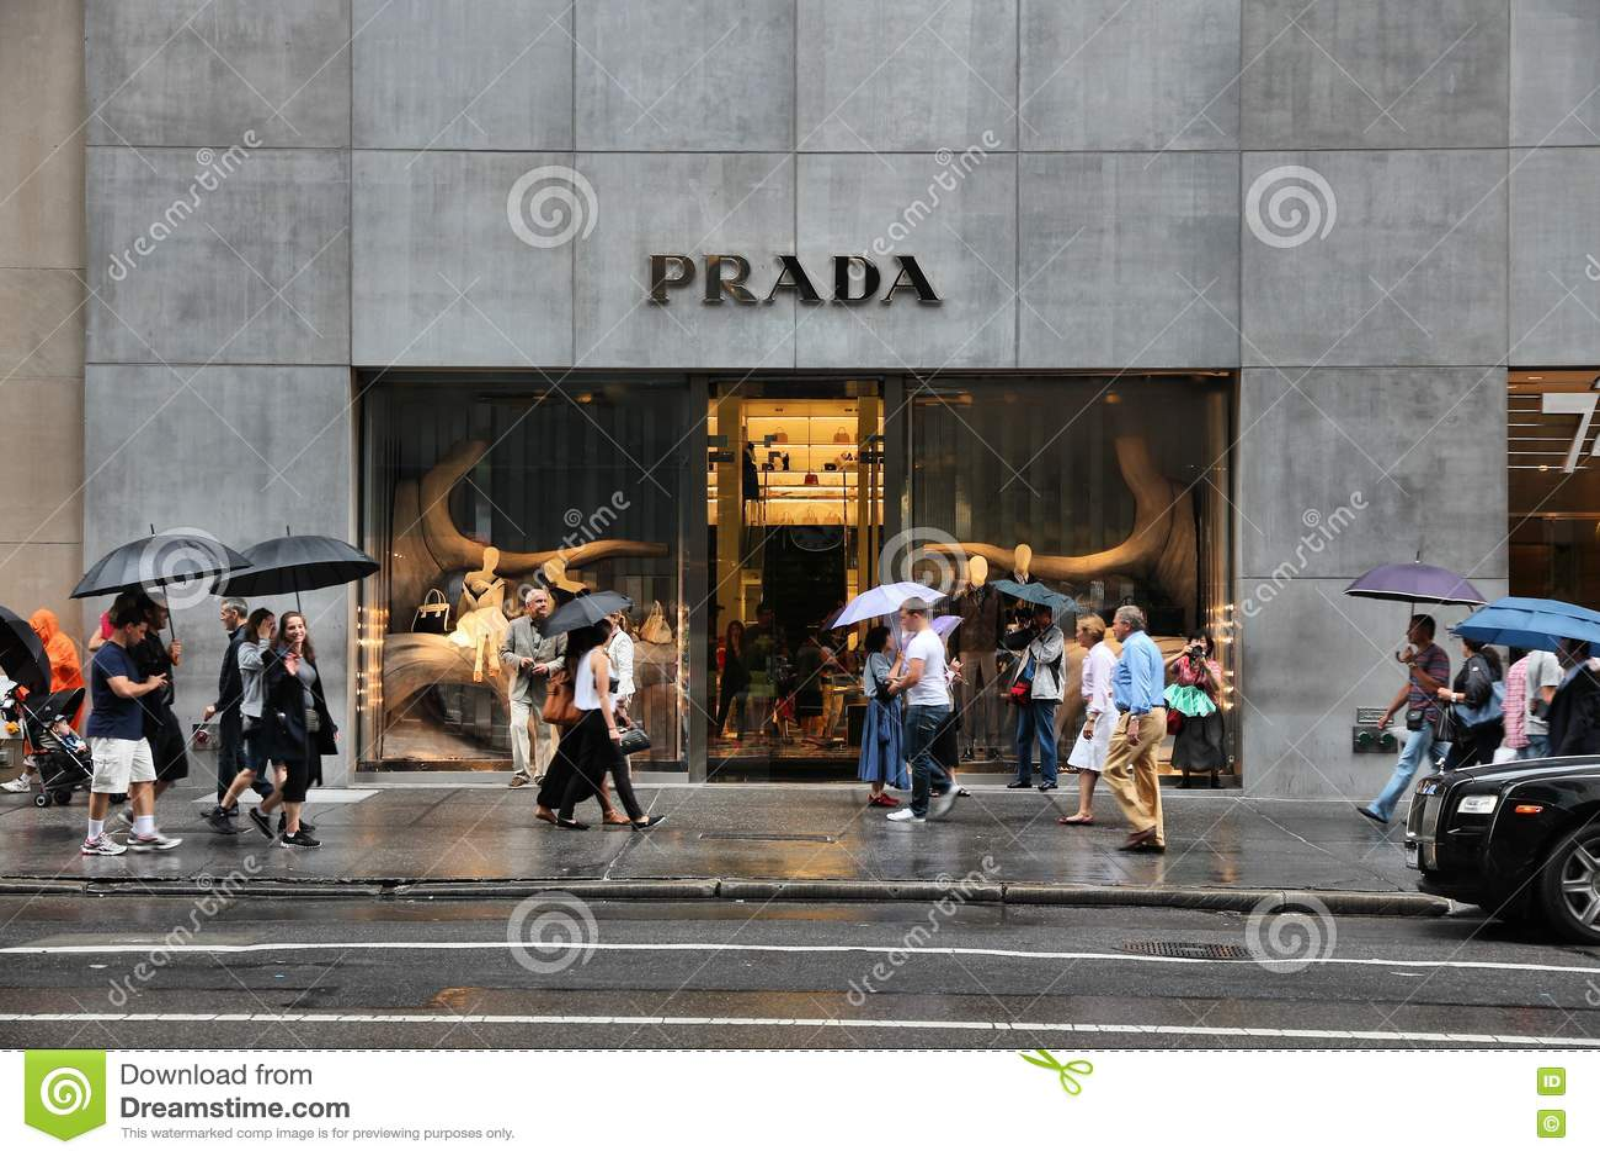 New York Prada